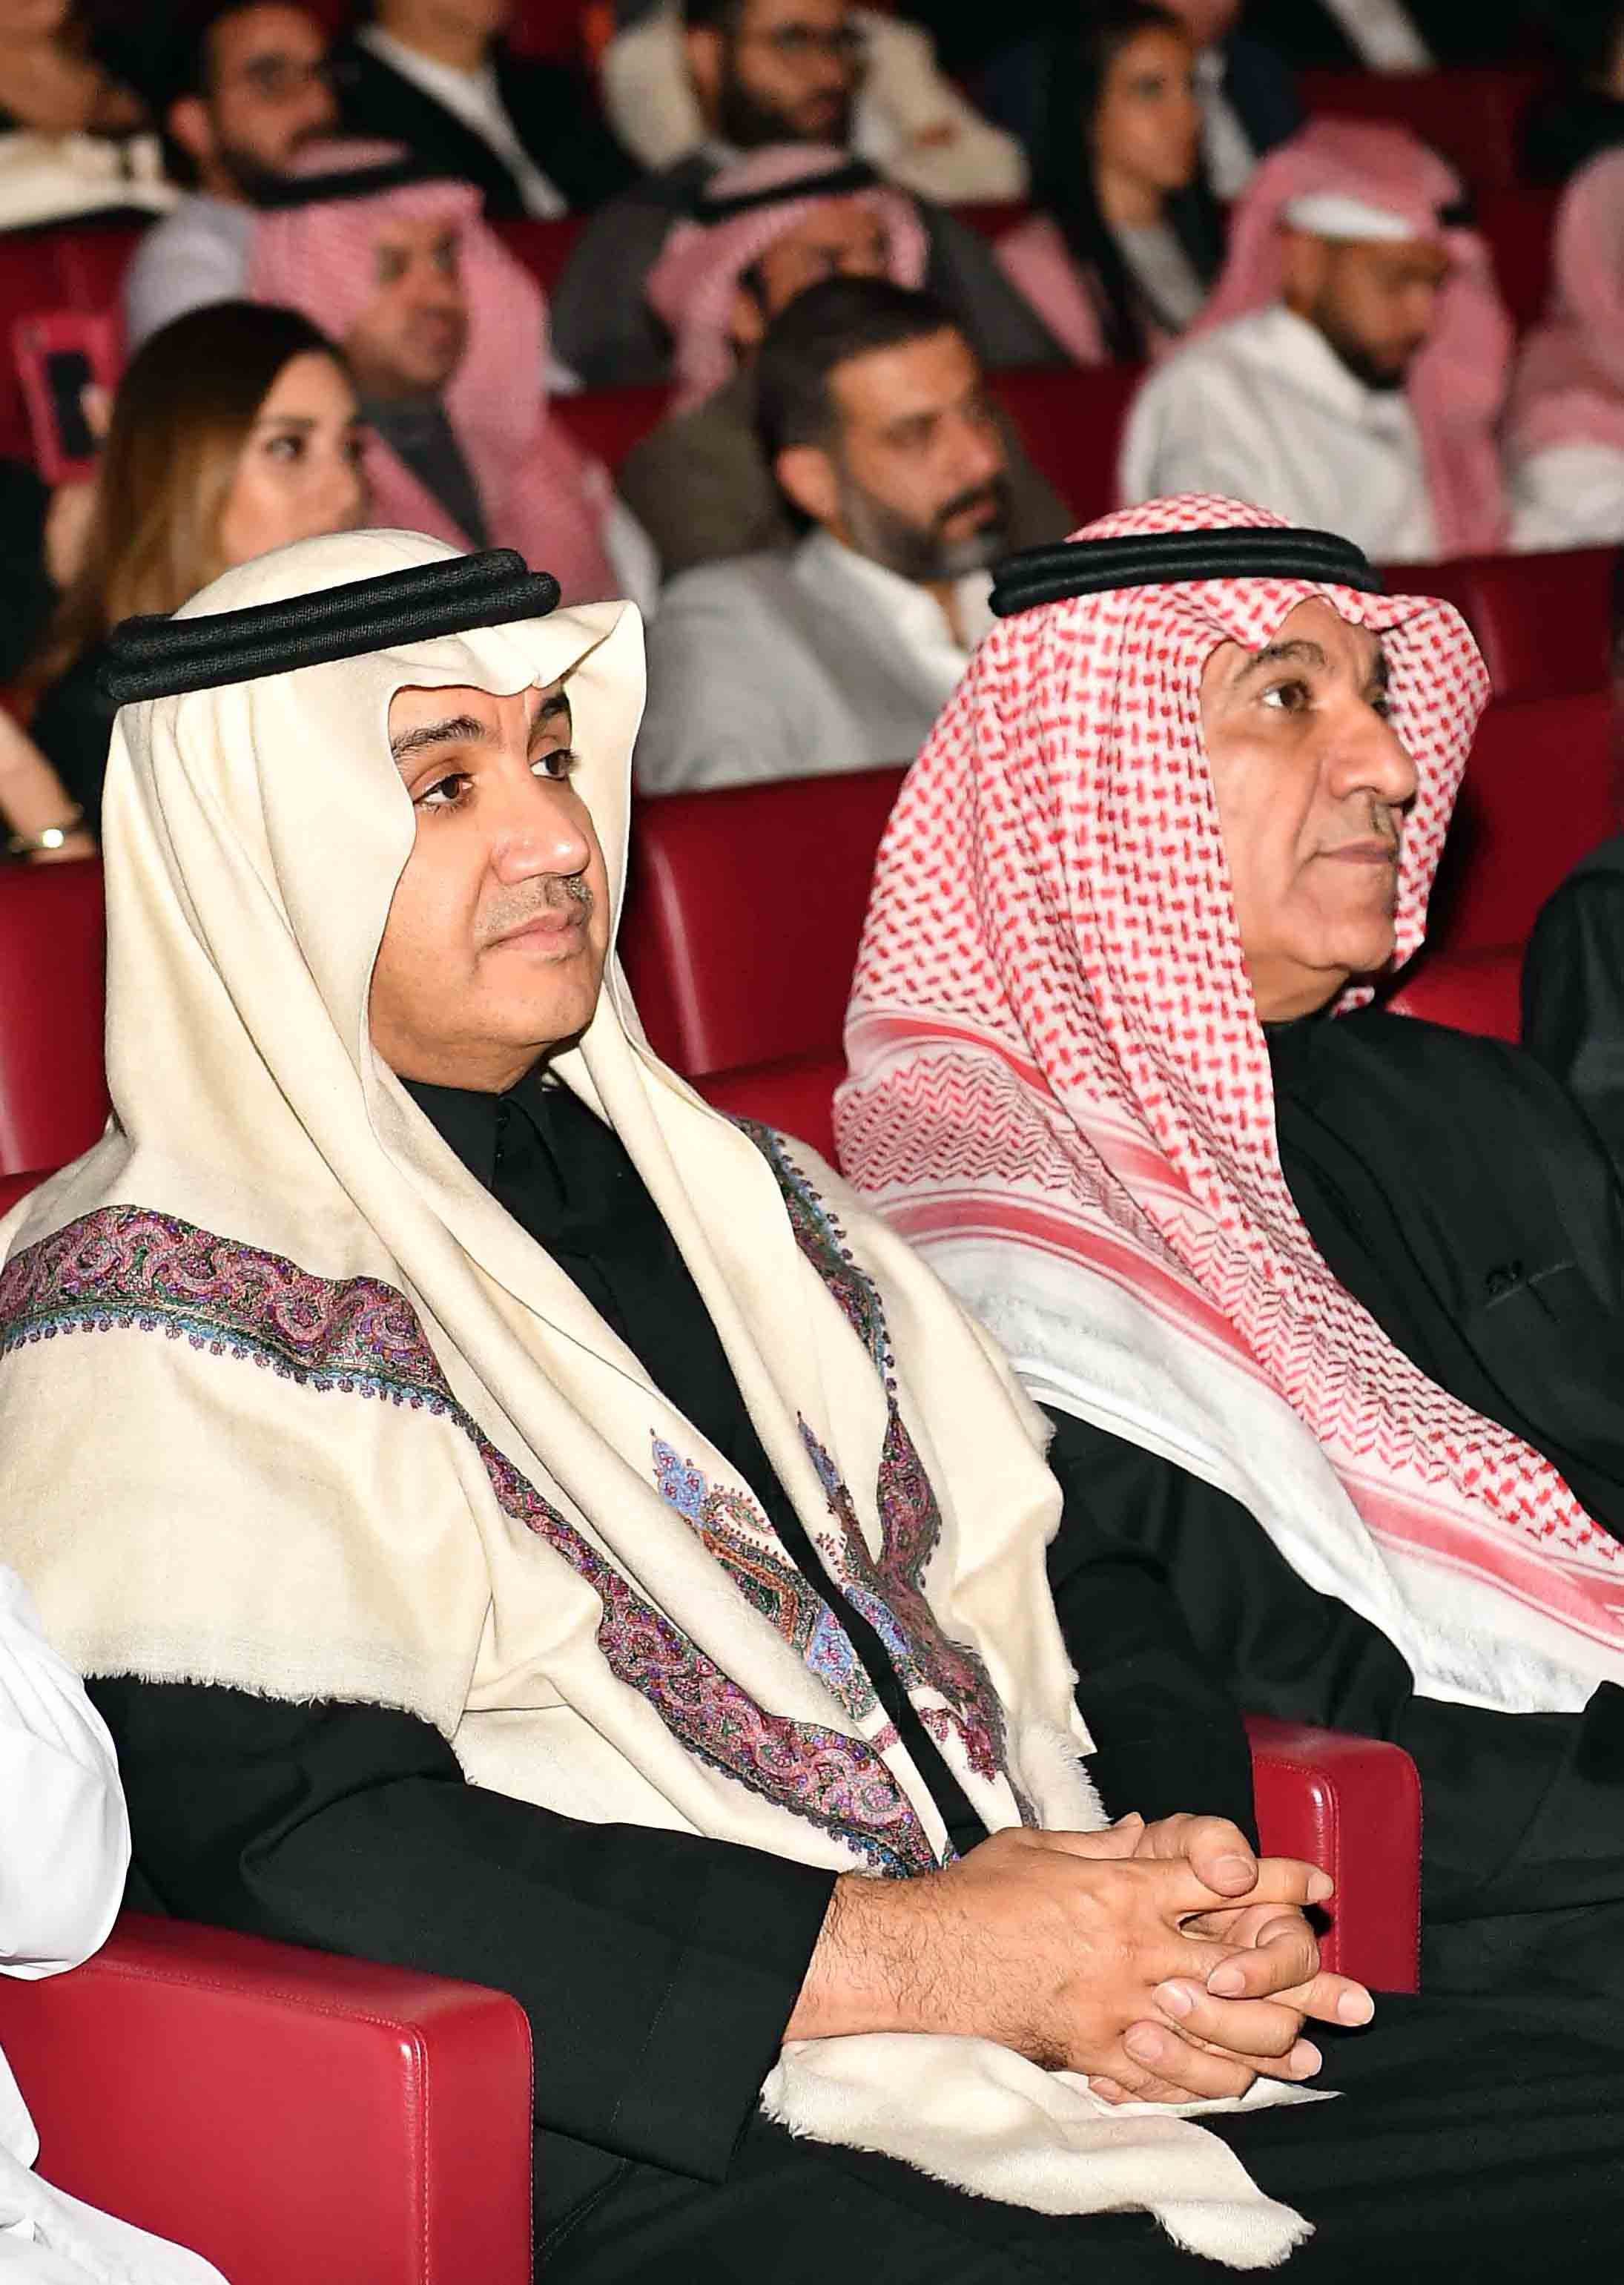 Shahid re-launch event - Turki Shabana & Waleed Al Ibrahim